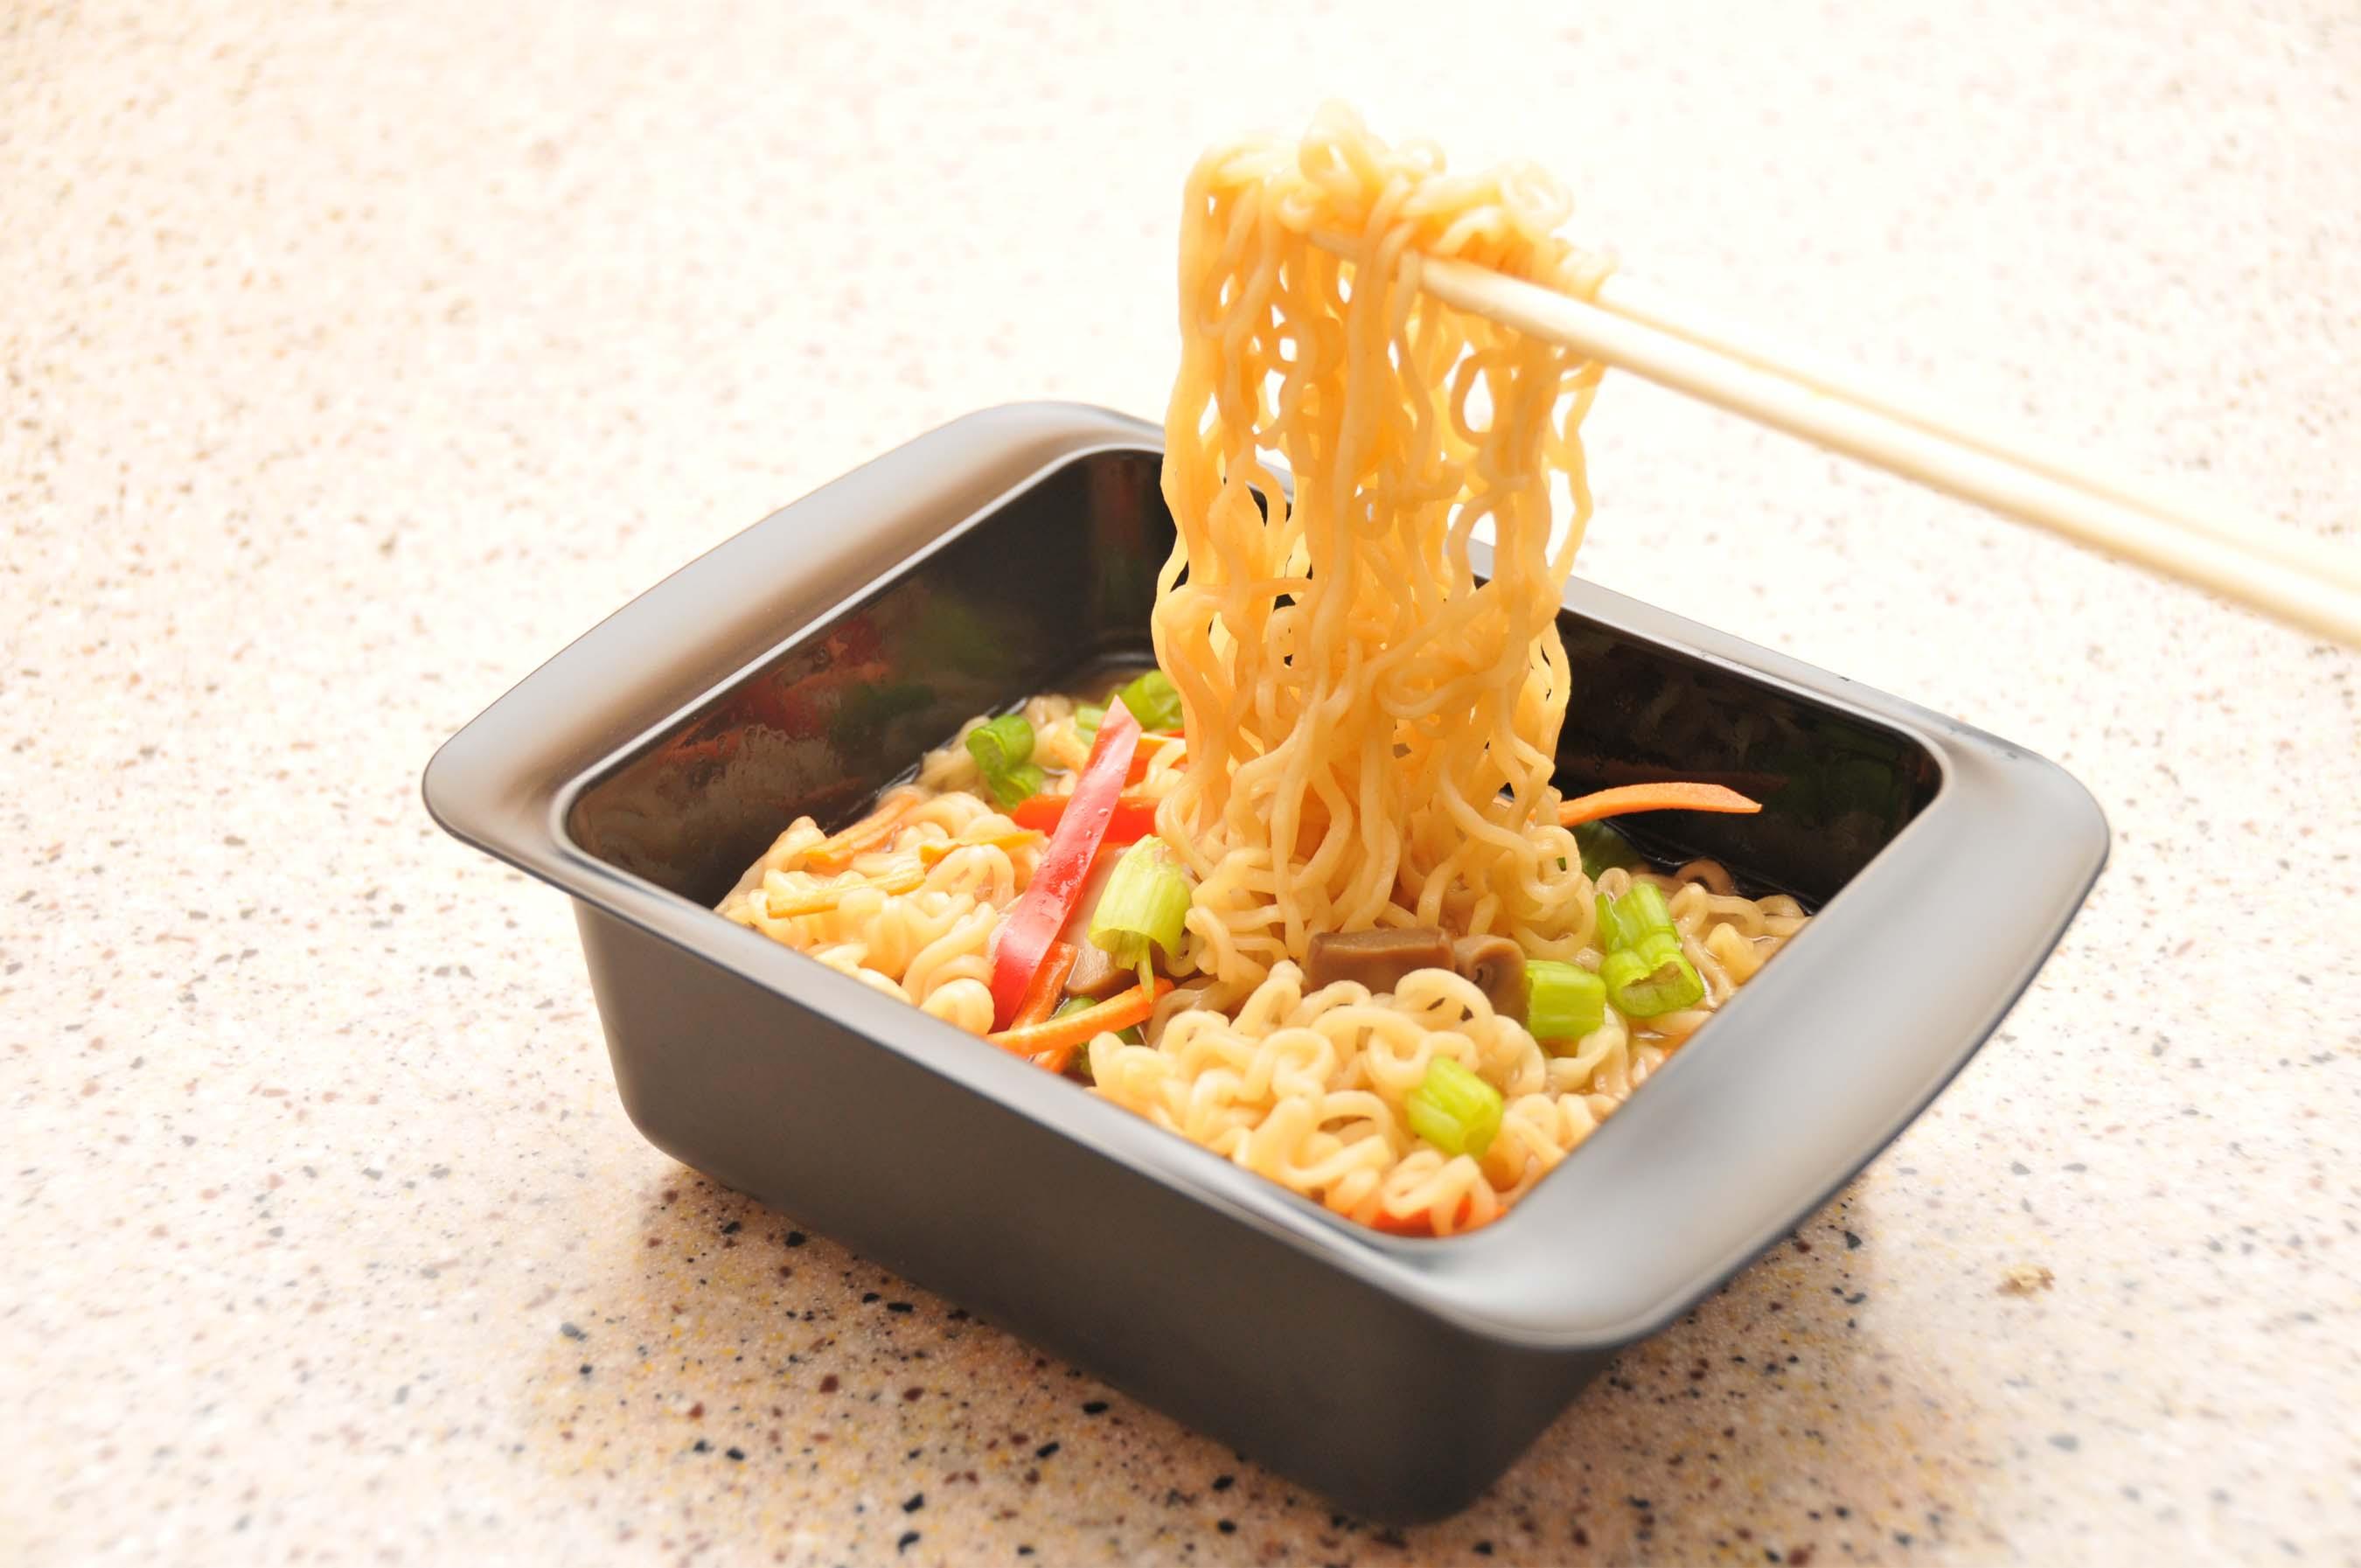 The Best Rapid Ramen Cooker Debuts at 2013 International Home